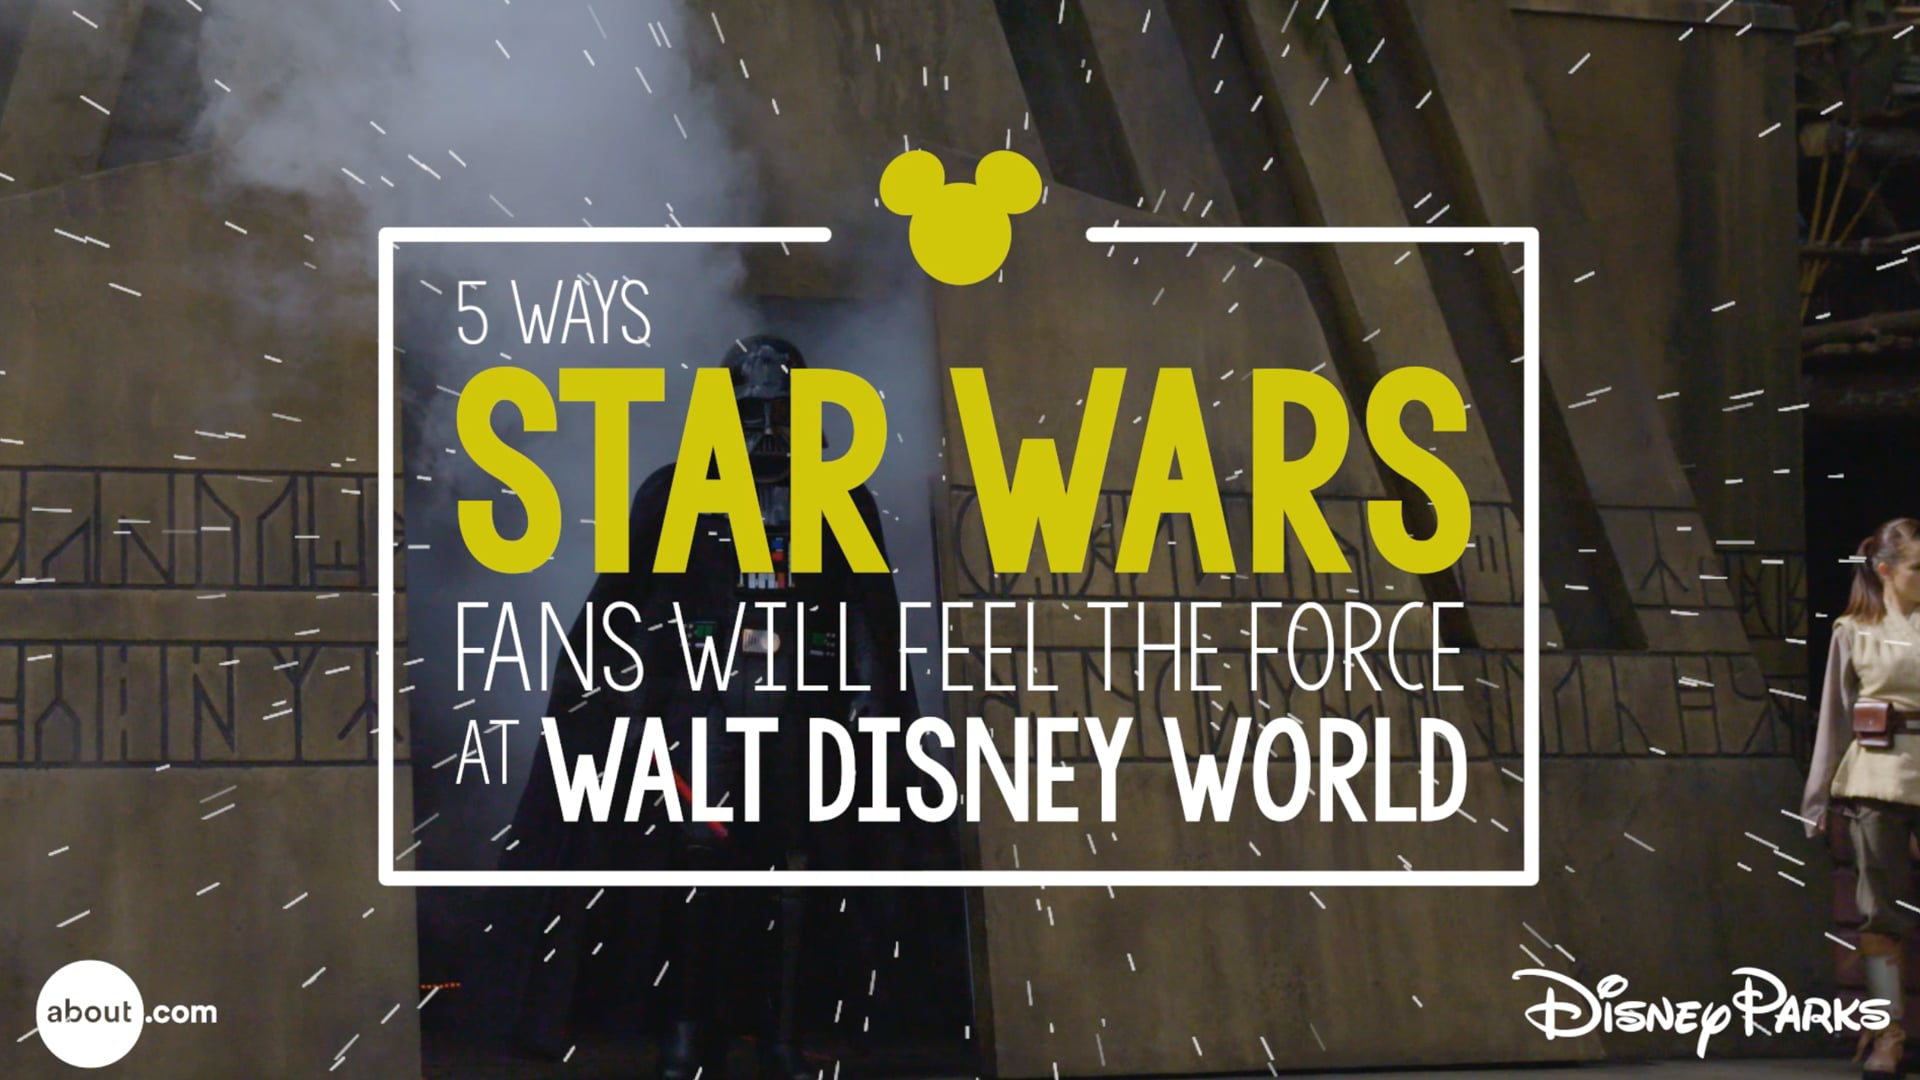 5 Ways Star Wars Fans Will Feel the Force at Walt Disney World